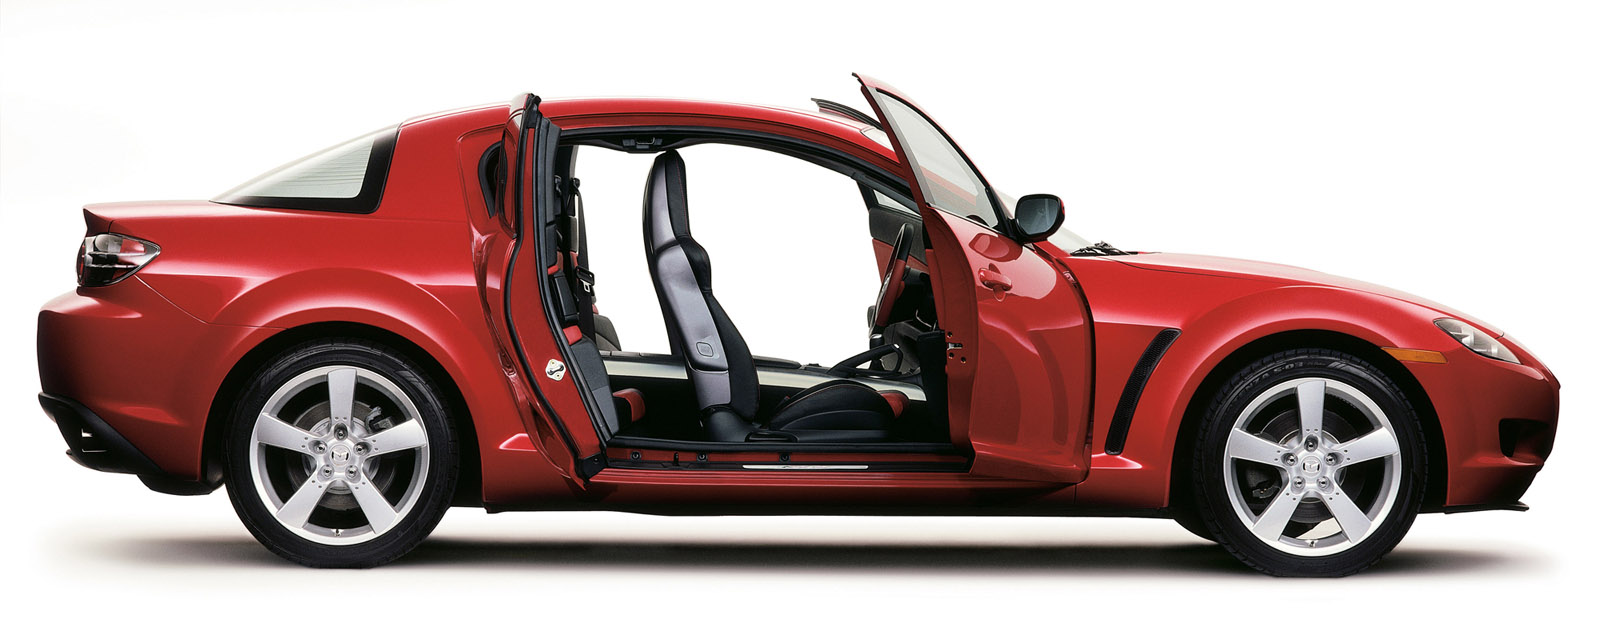 Name: 2004-Mazda-RX-8-Side-Doors-Open.